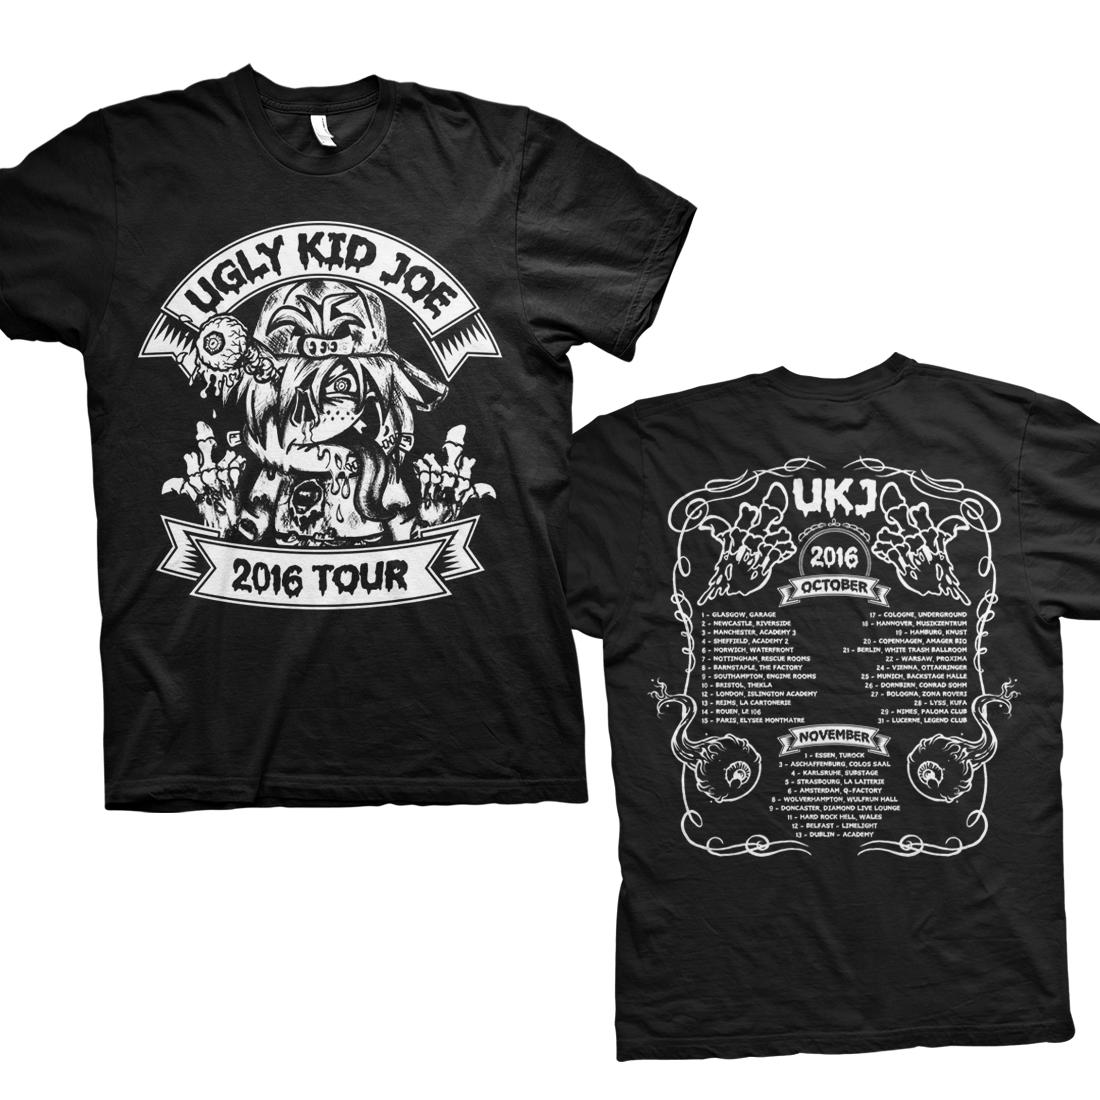 Finger Kid Tour – Tee - Ugly Kid Joe